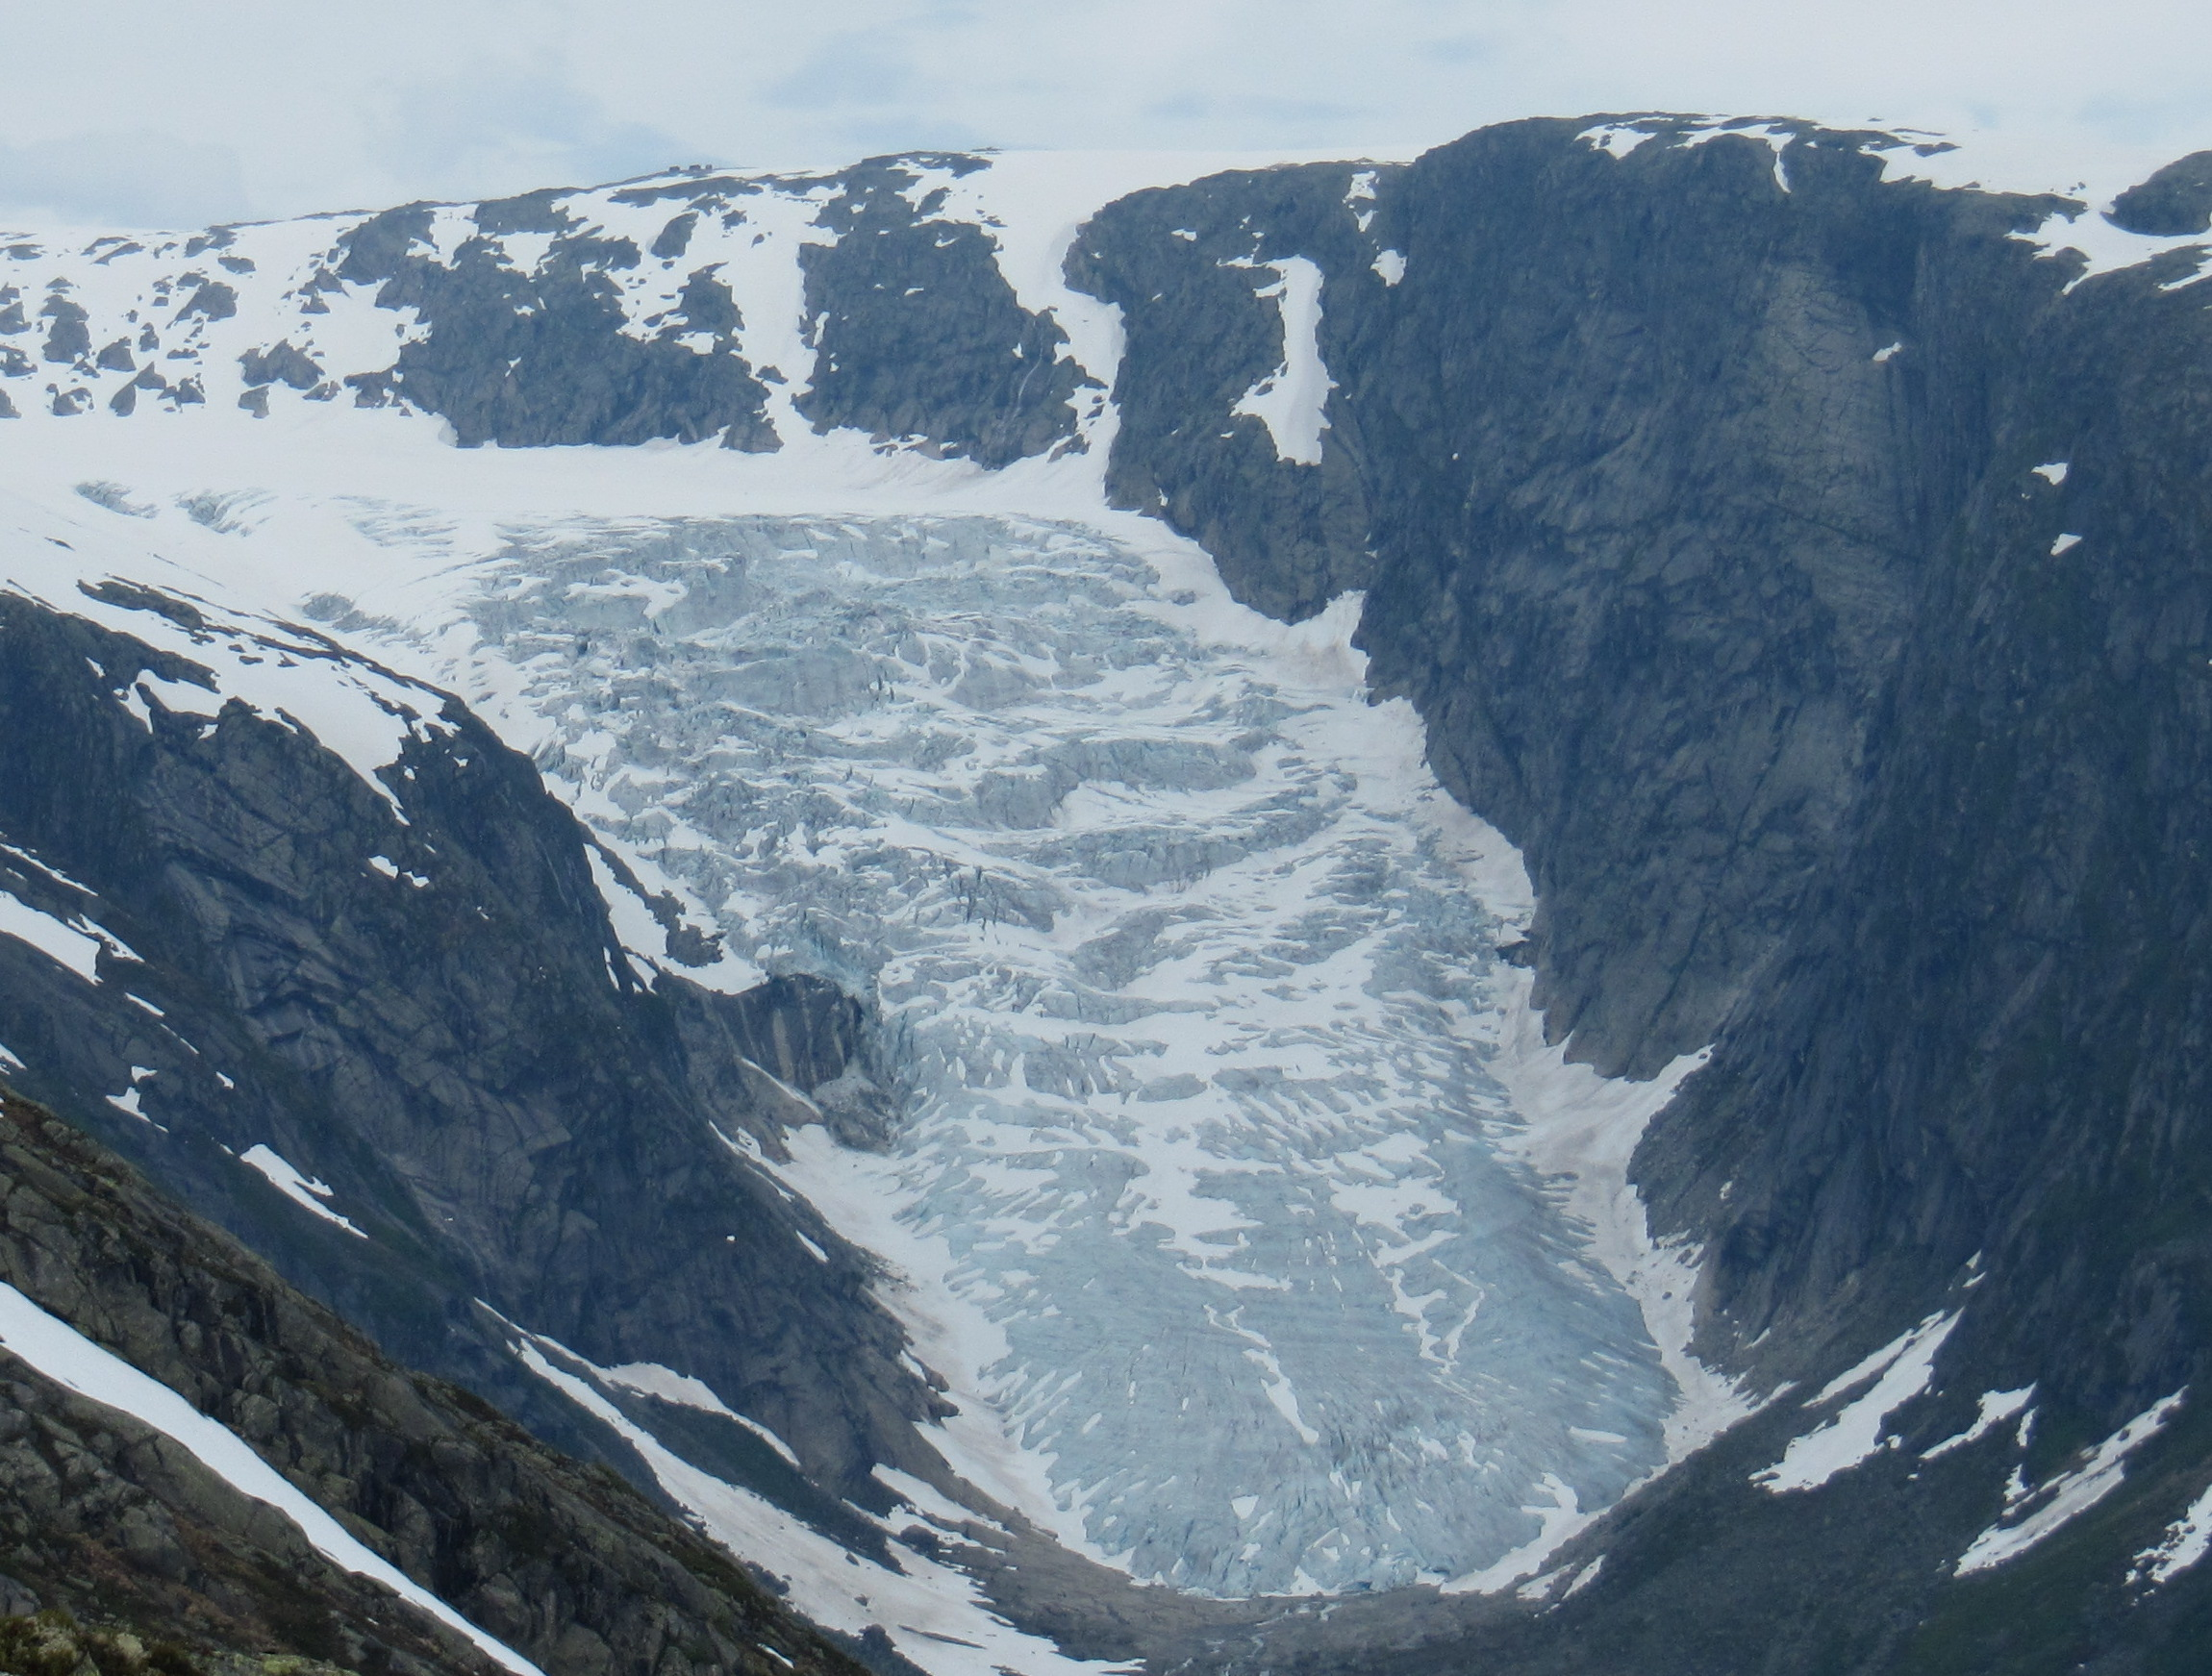 Tuftebreen. Likevektslina er i skillet mellom blåis og snø. Foto: Pål Gran Kielland.